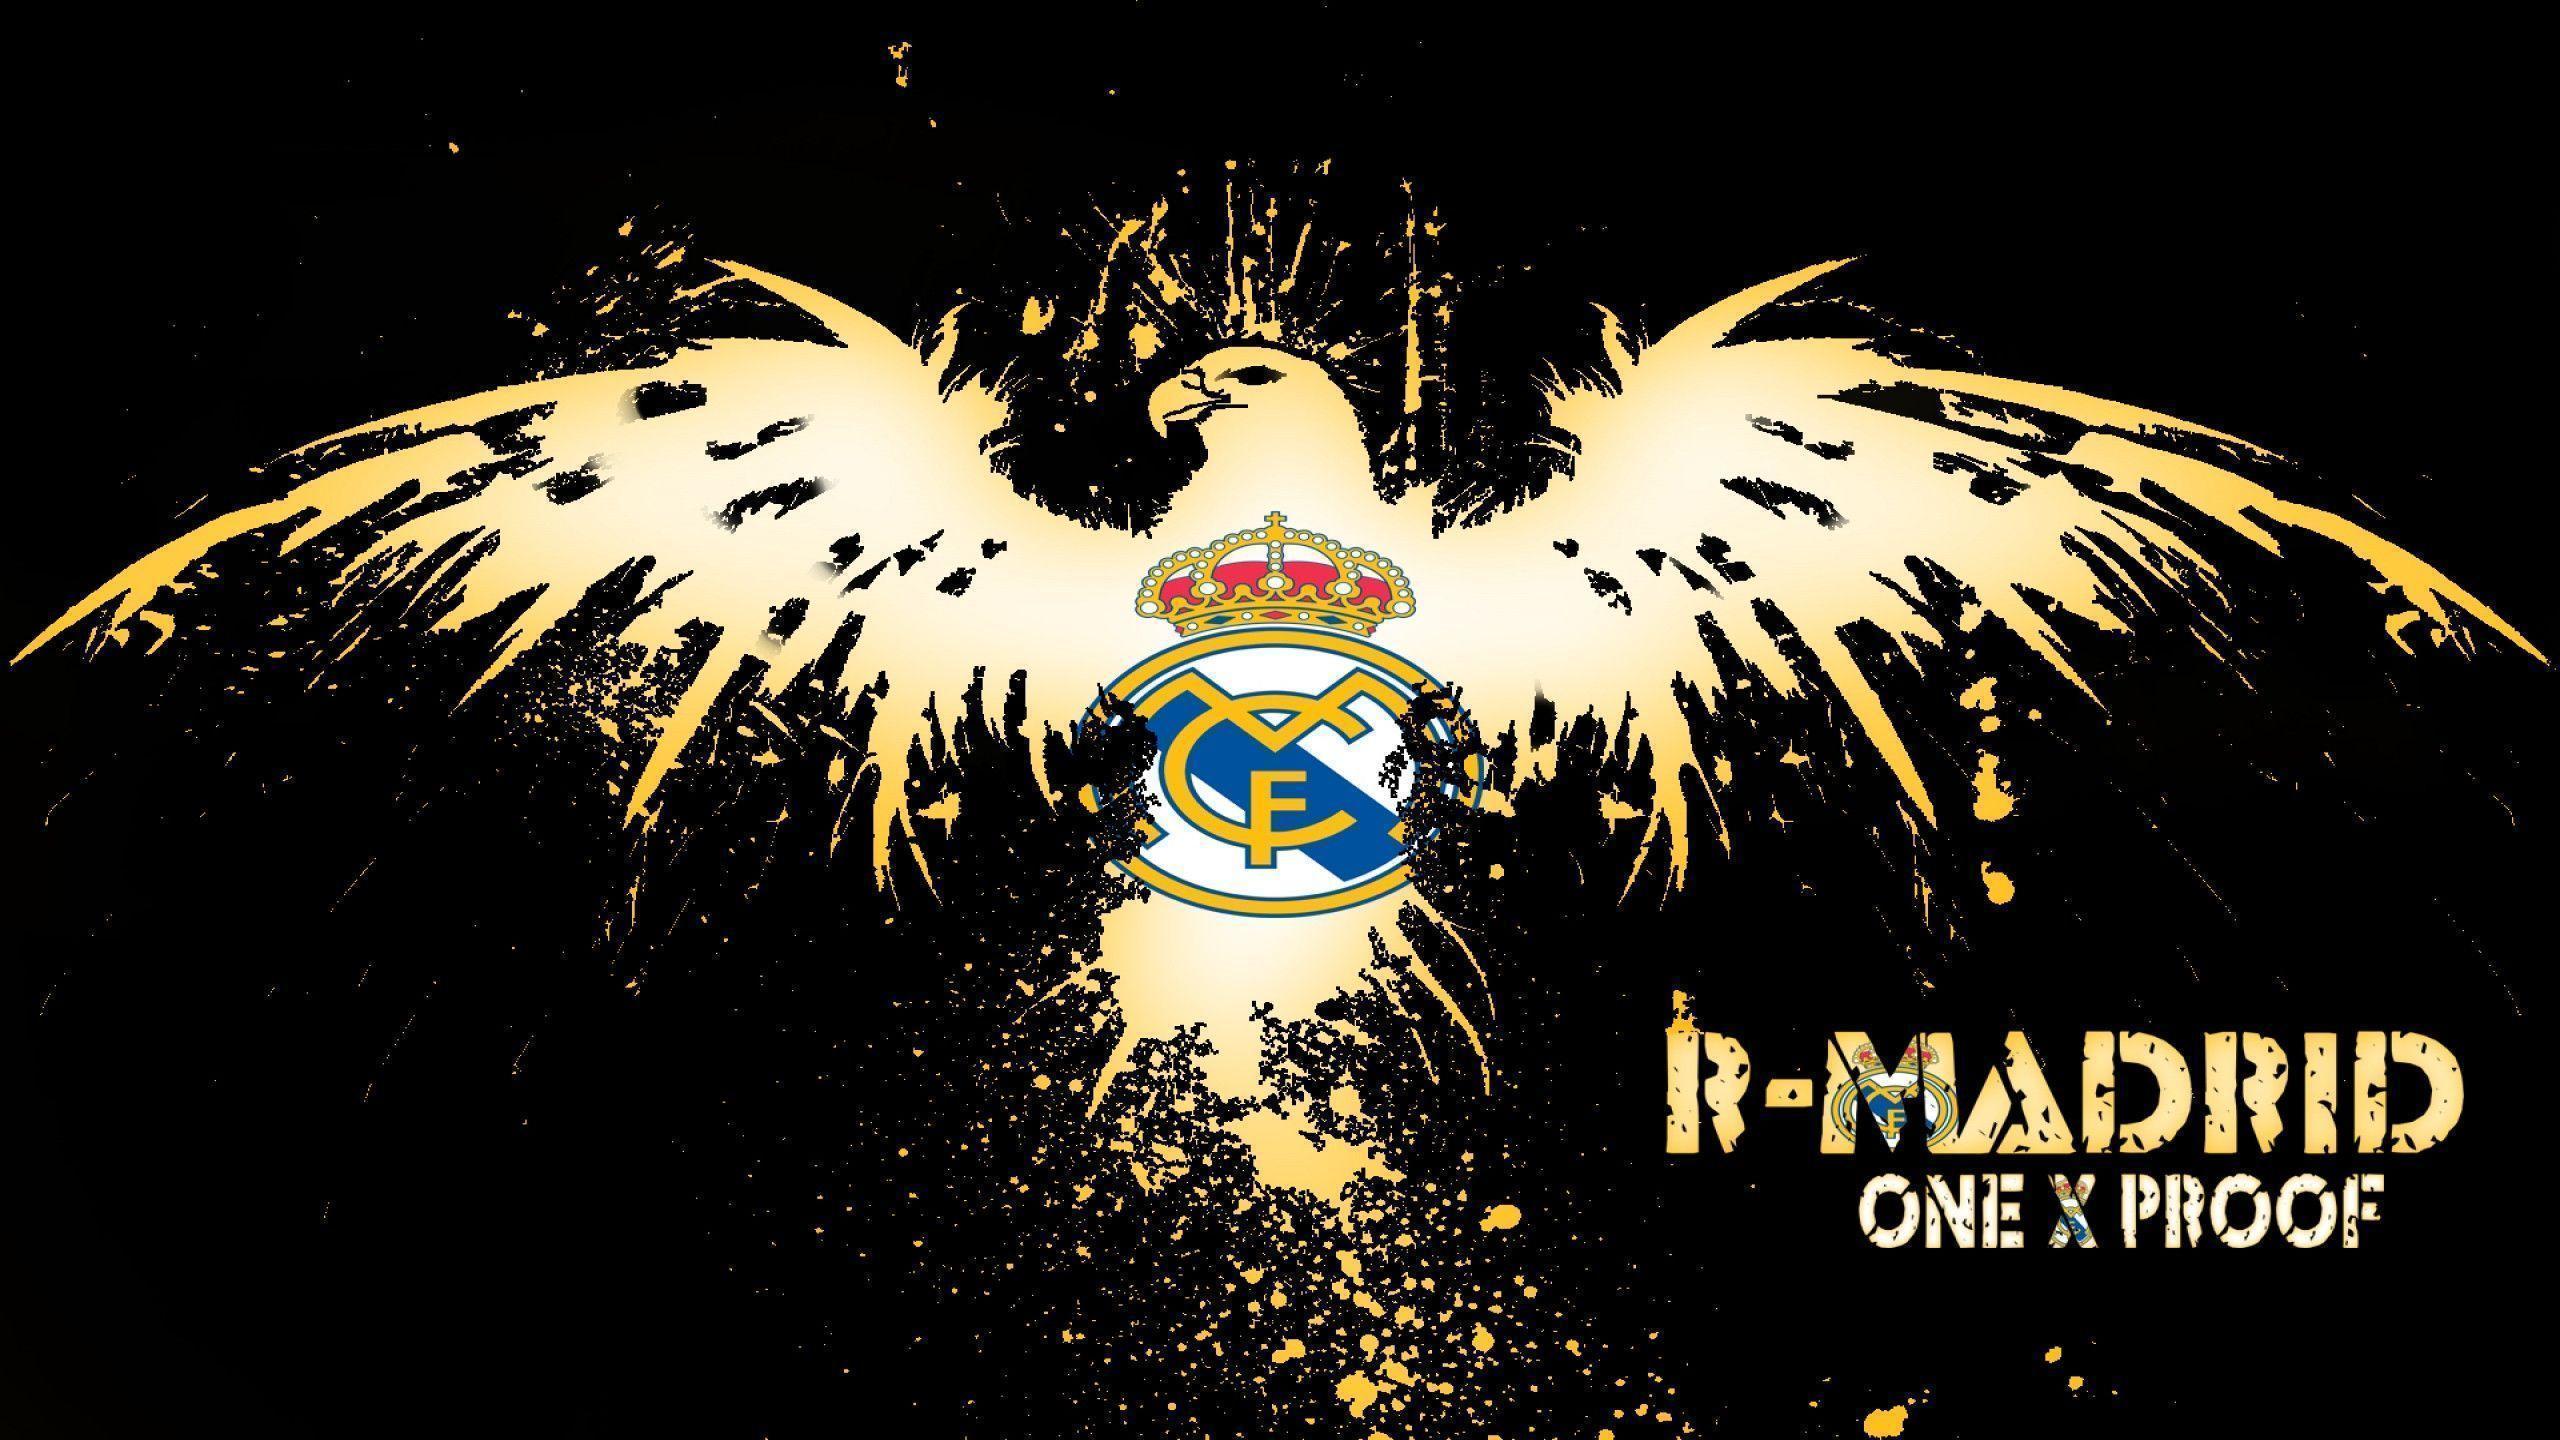 Real Madrid Cf Logo HD Wallpaper #5389 Wallpaper computer | best .